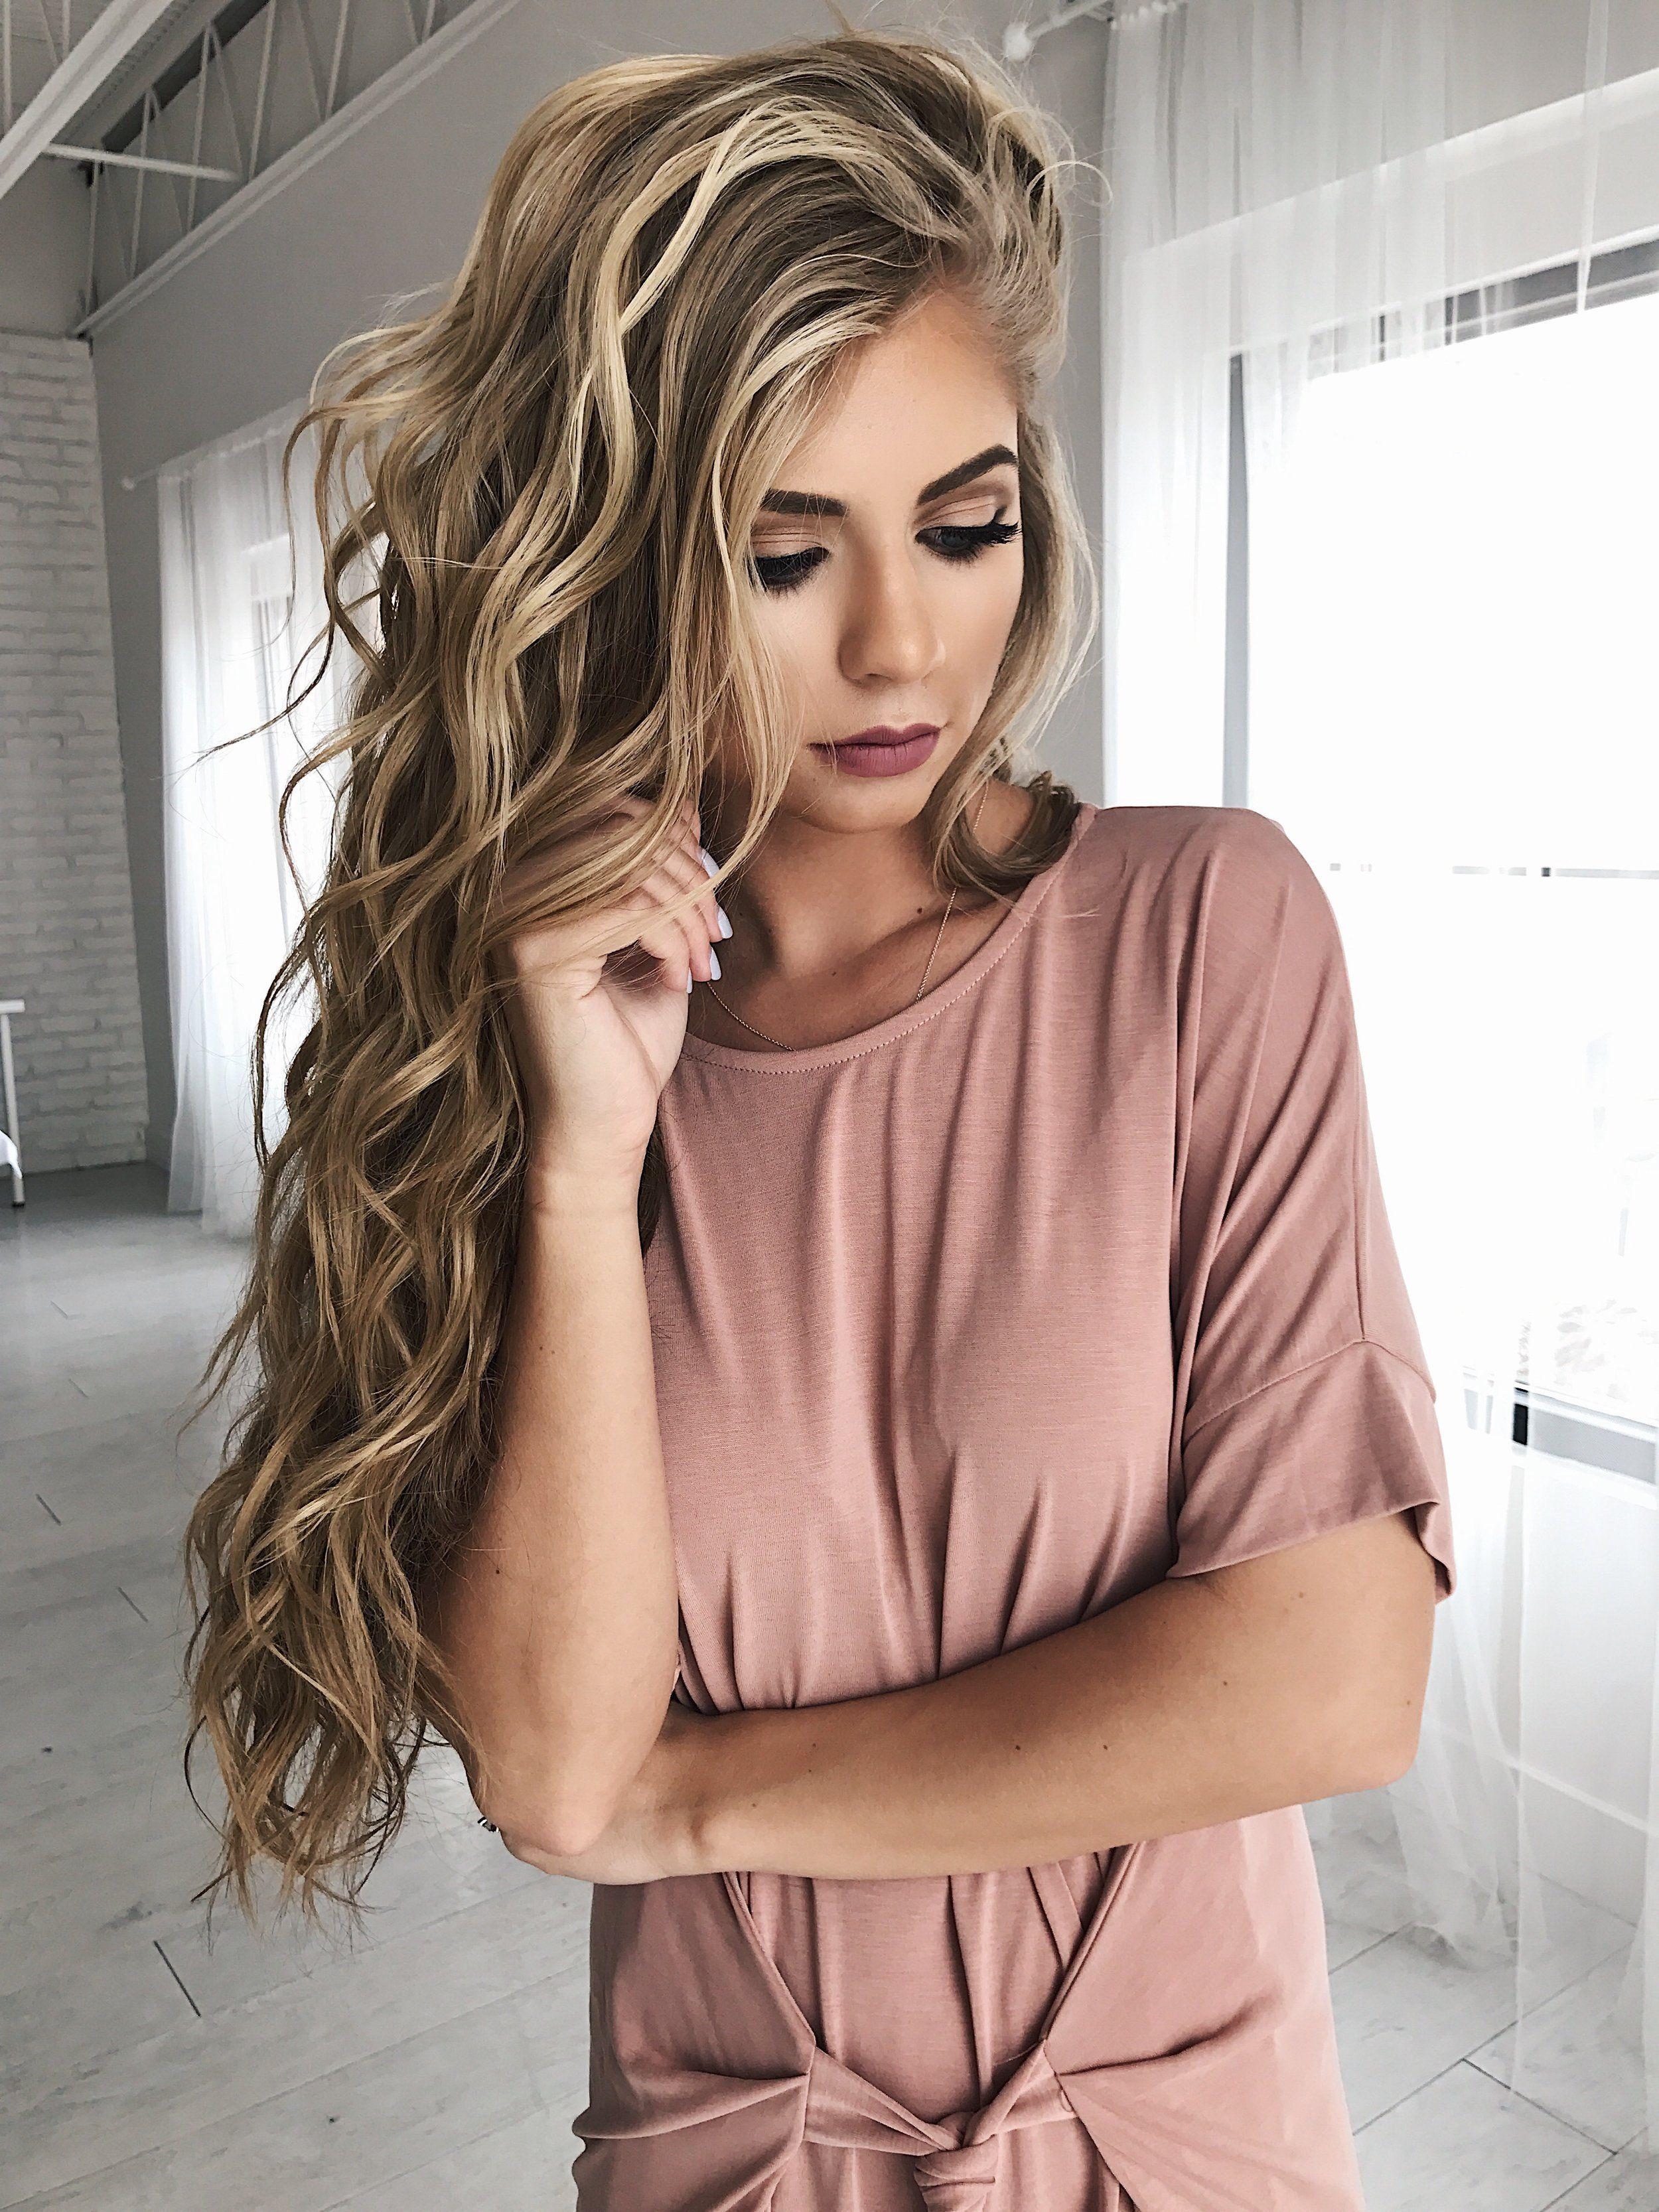 Widescreen blonde hair ideas for laptop full hd pics makeup bold lip eyeshadow vin